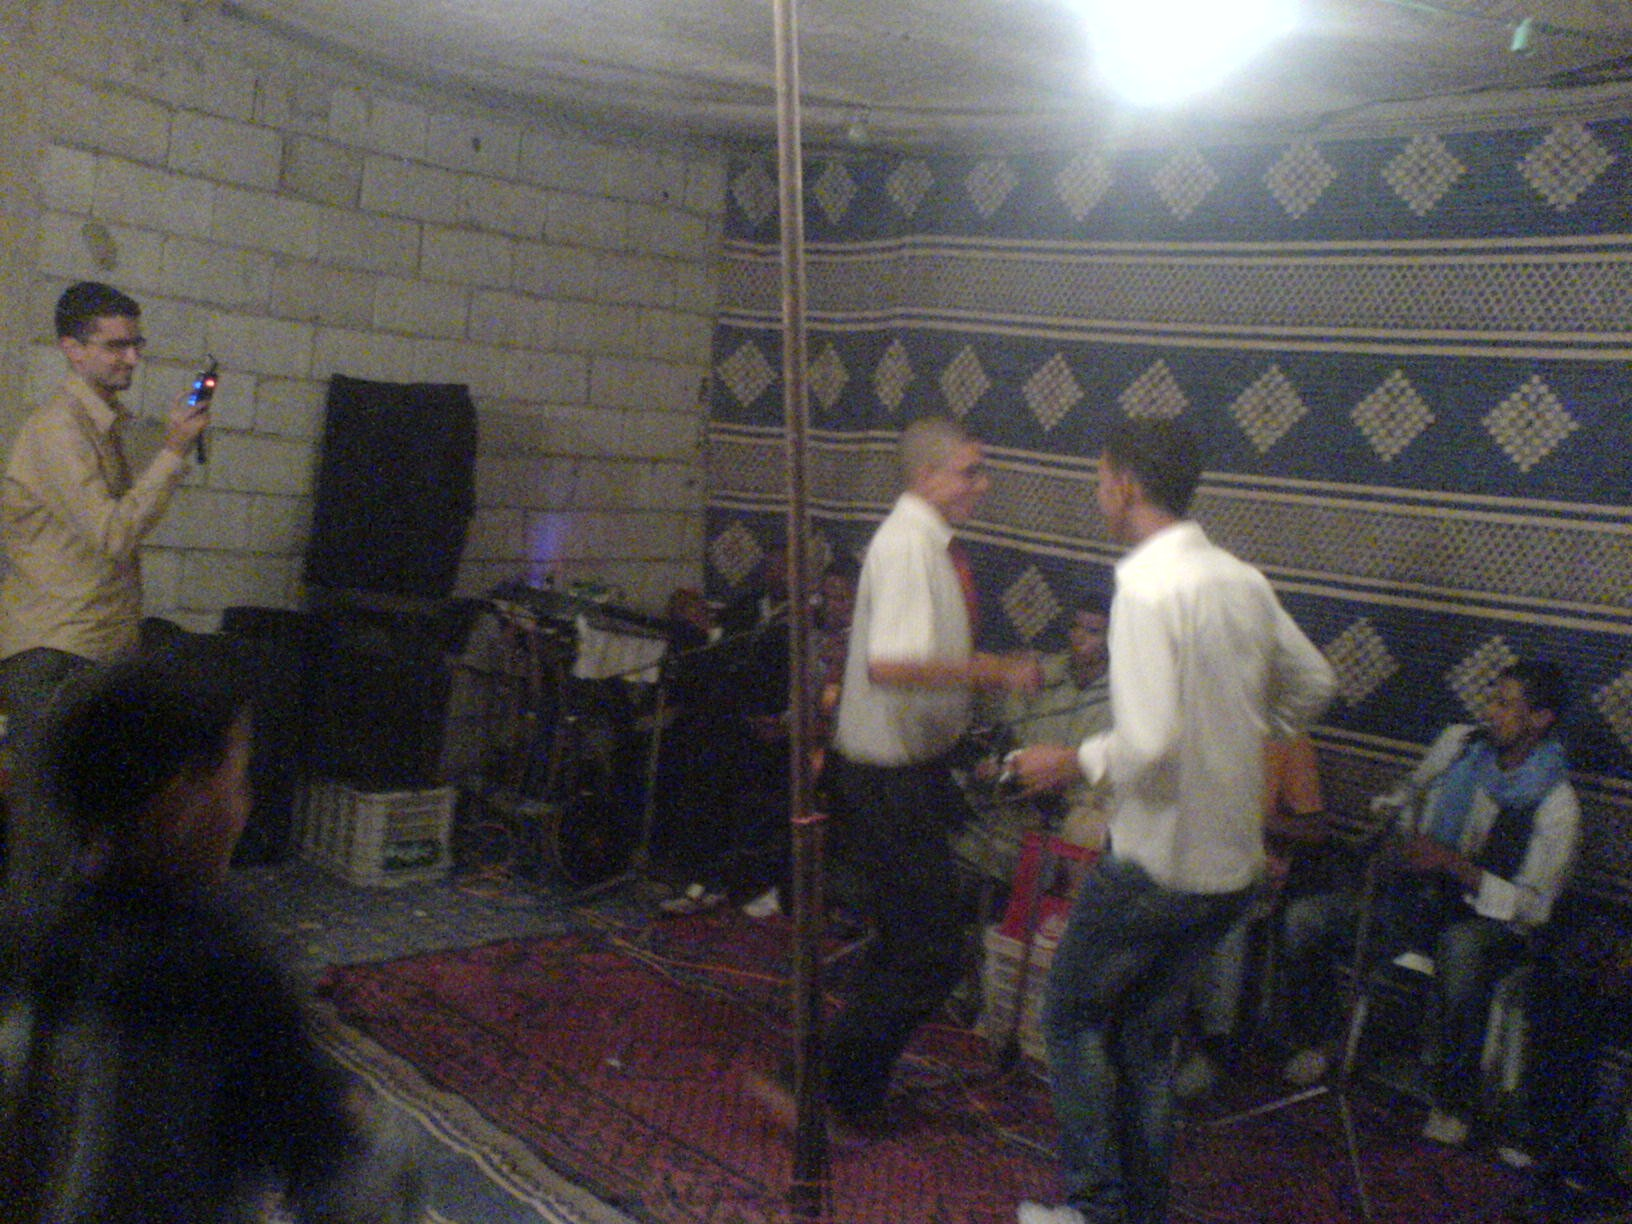 zohayr : AIT ZOUHAYR